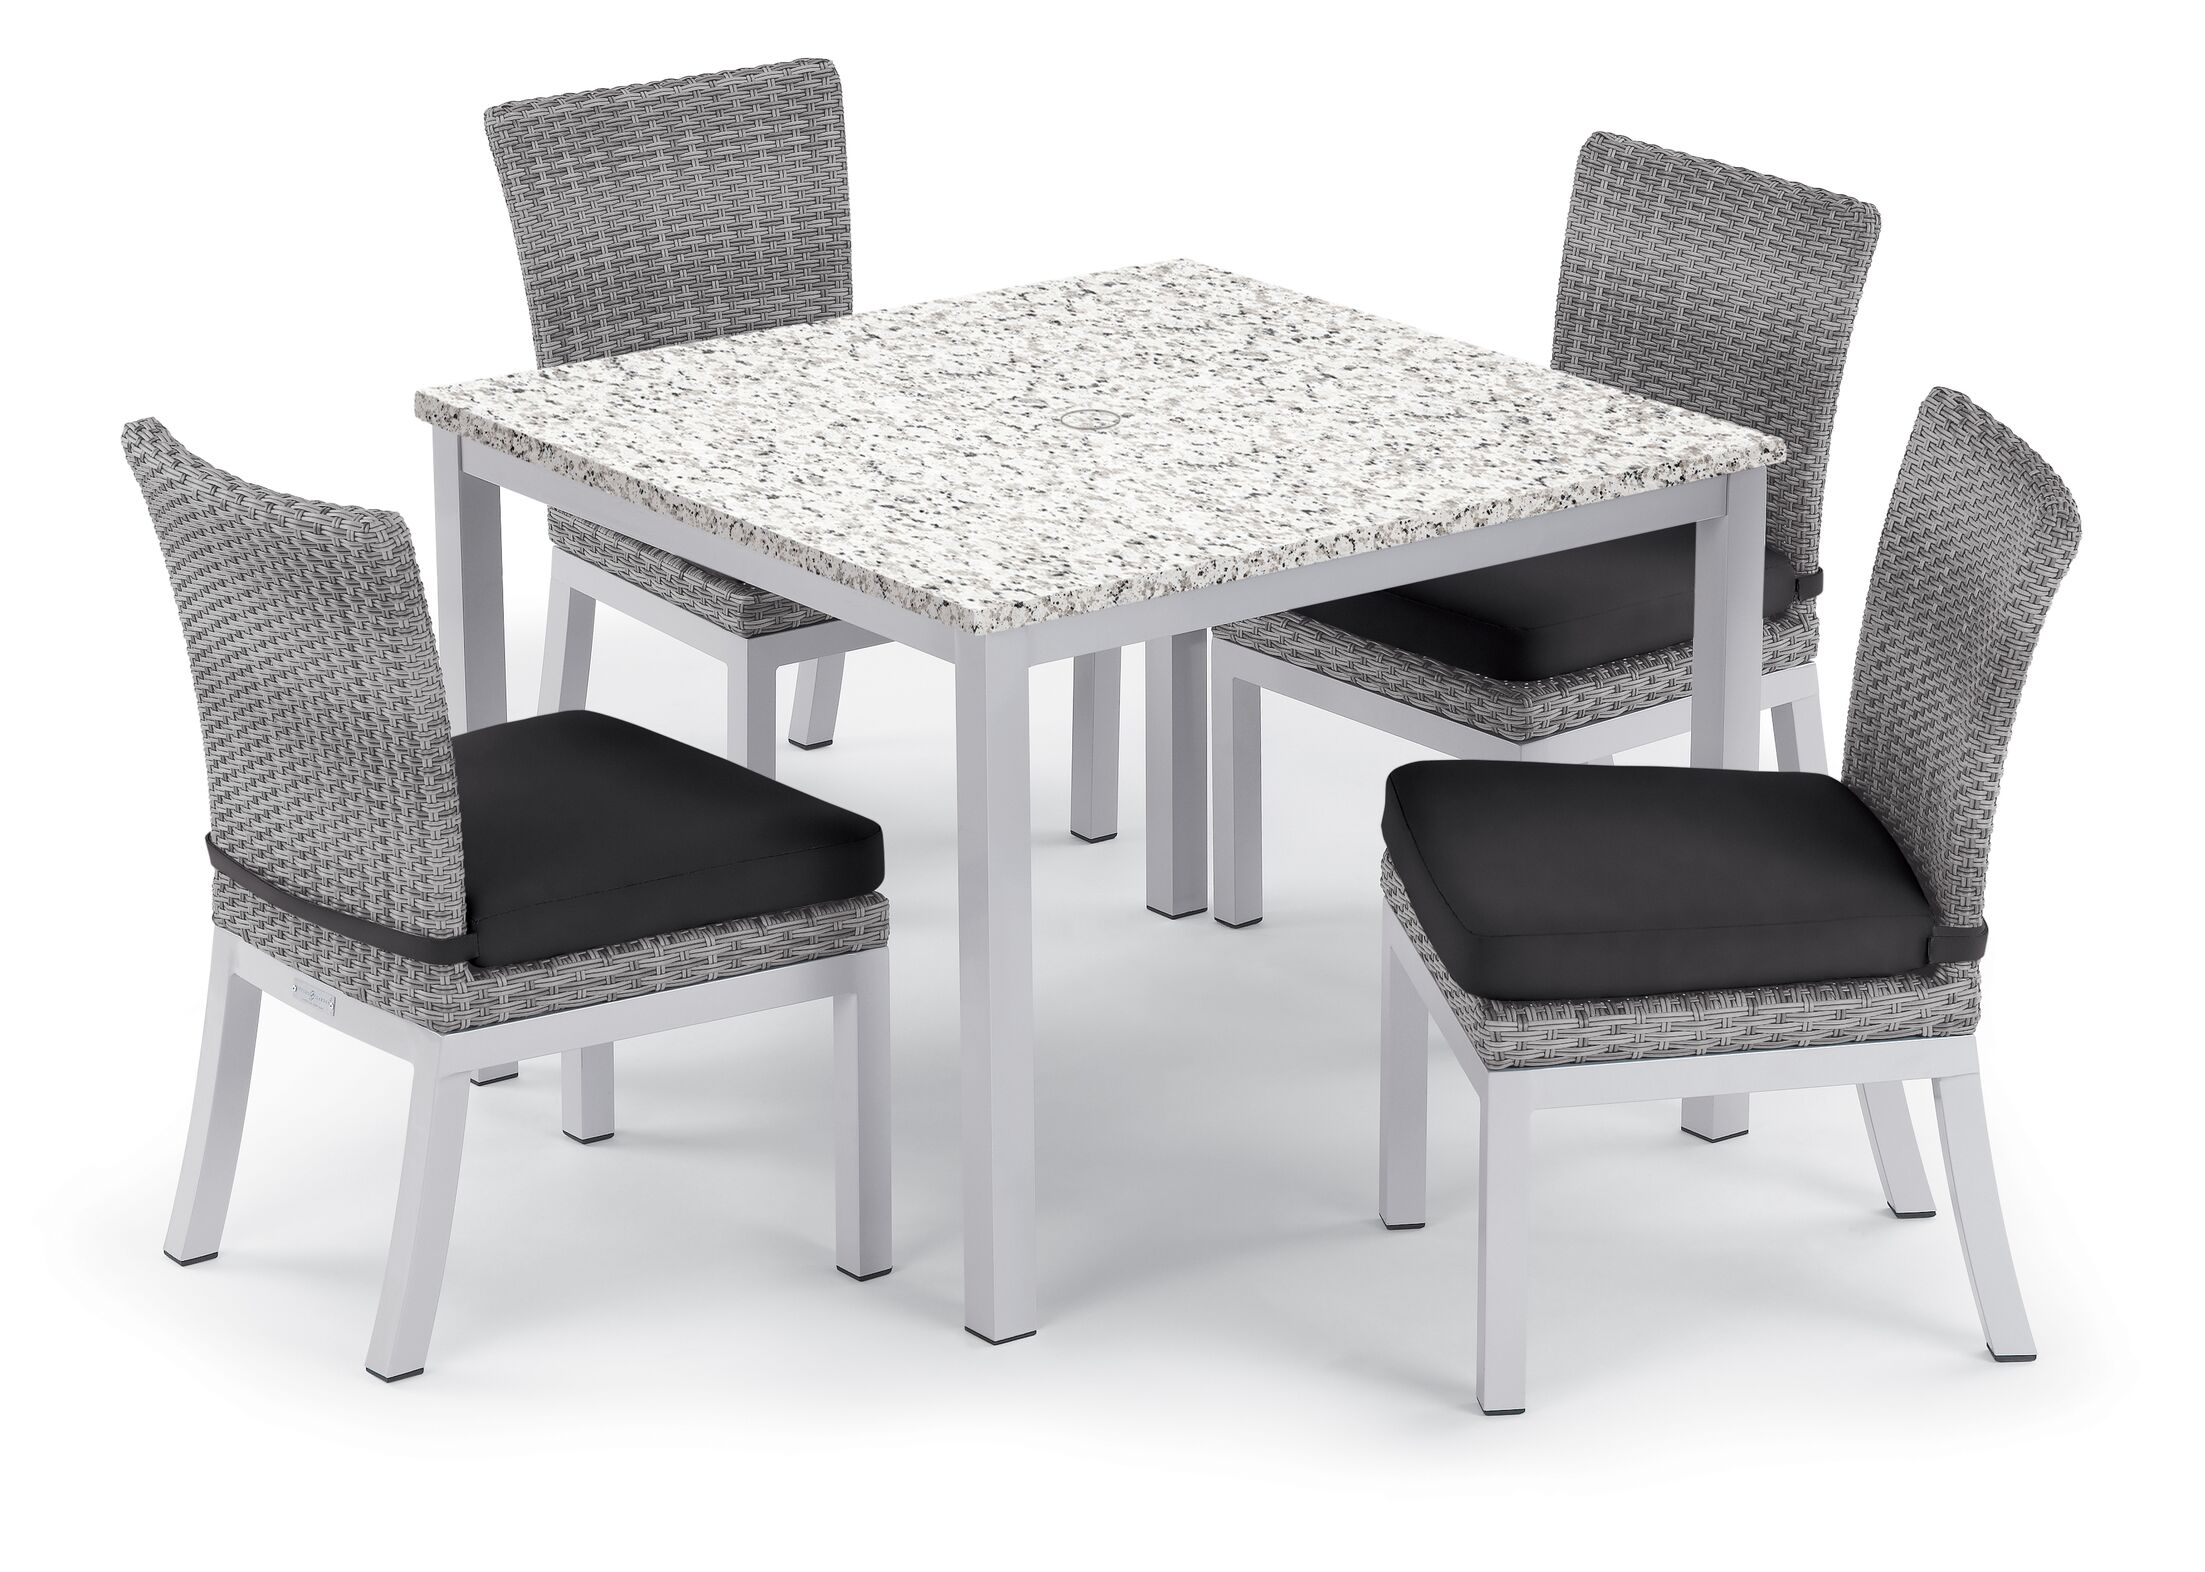 Saleh 5 Piece Dining Set with Cushion Cushion Color: Jet Black, Table Top Color: Ash